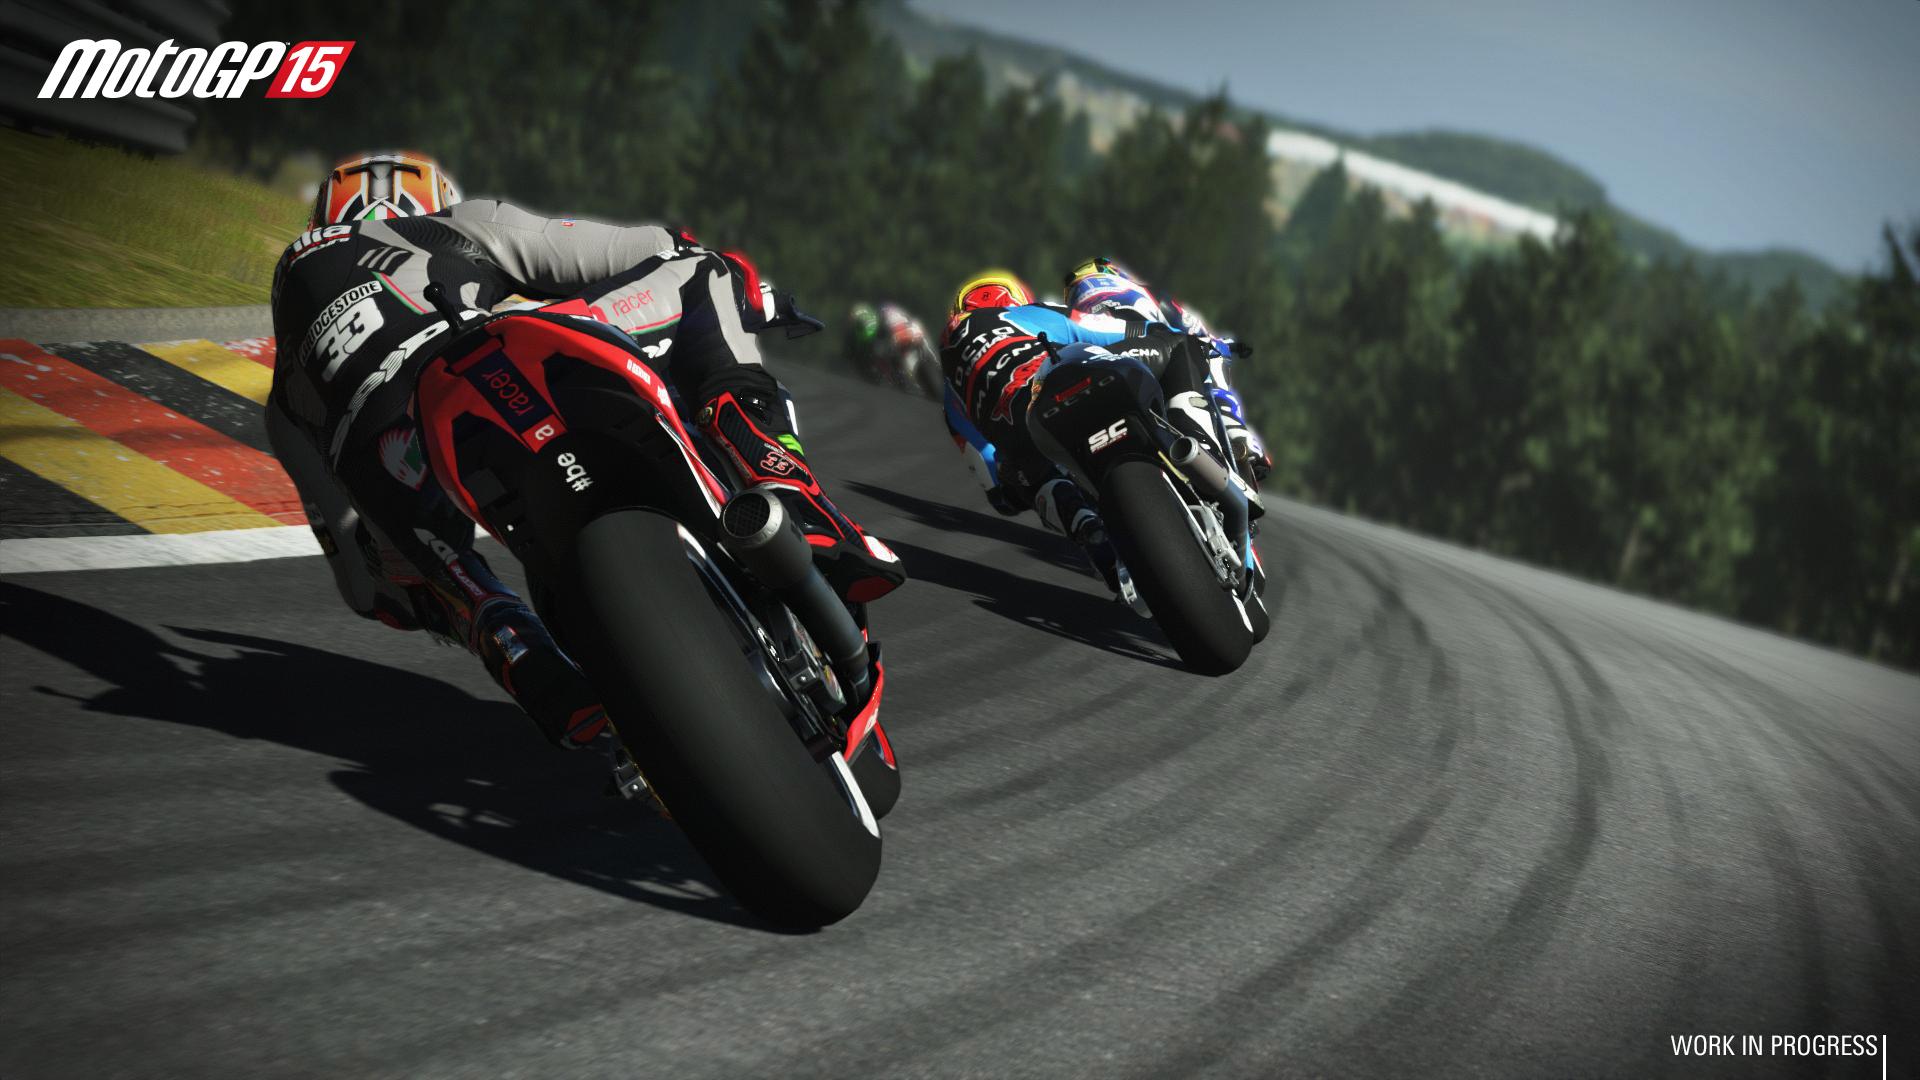 date motogp 2015